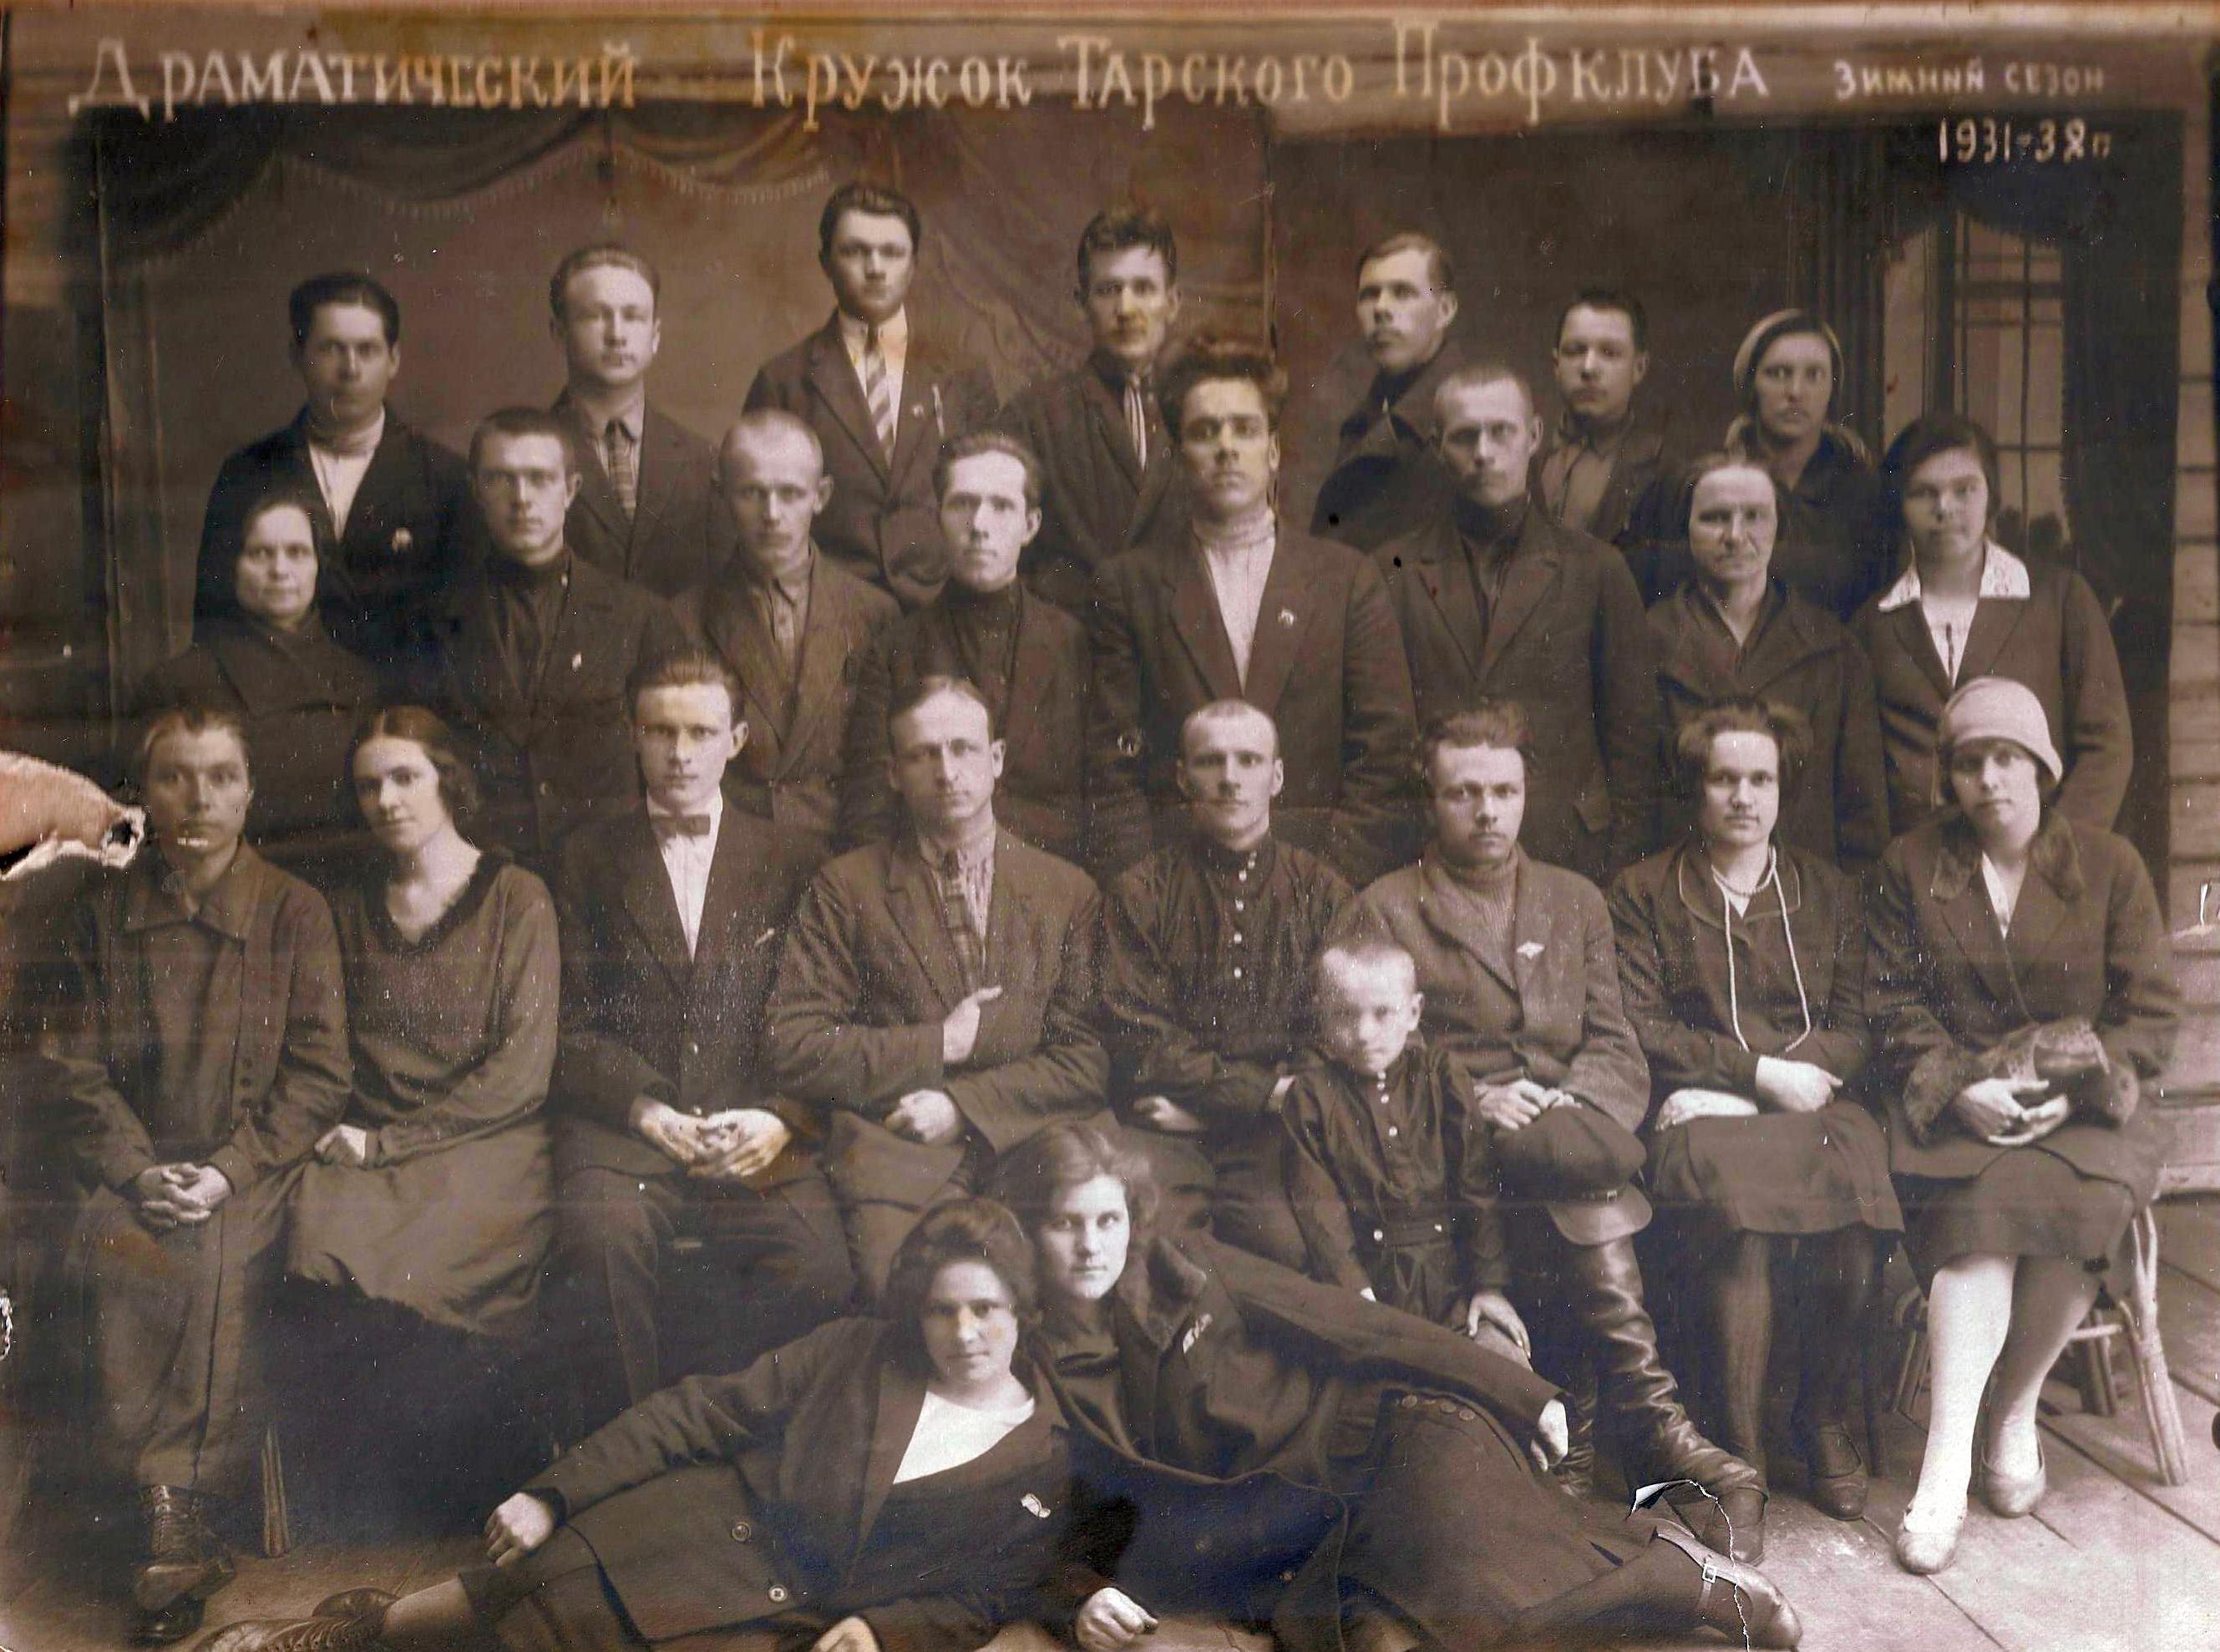 1937-1938. Драматический Кружок Тарского Профклуба